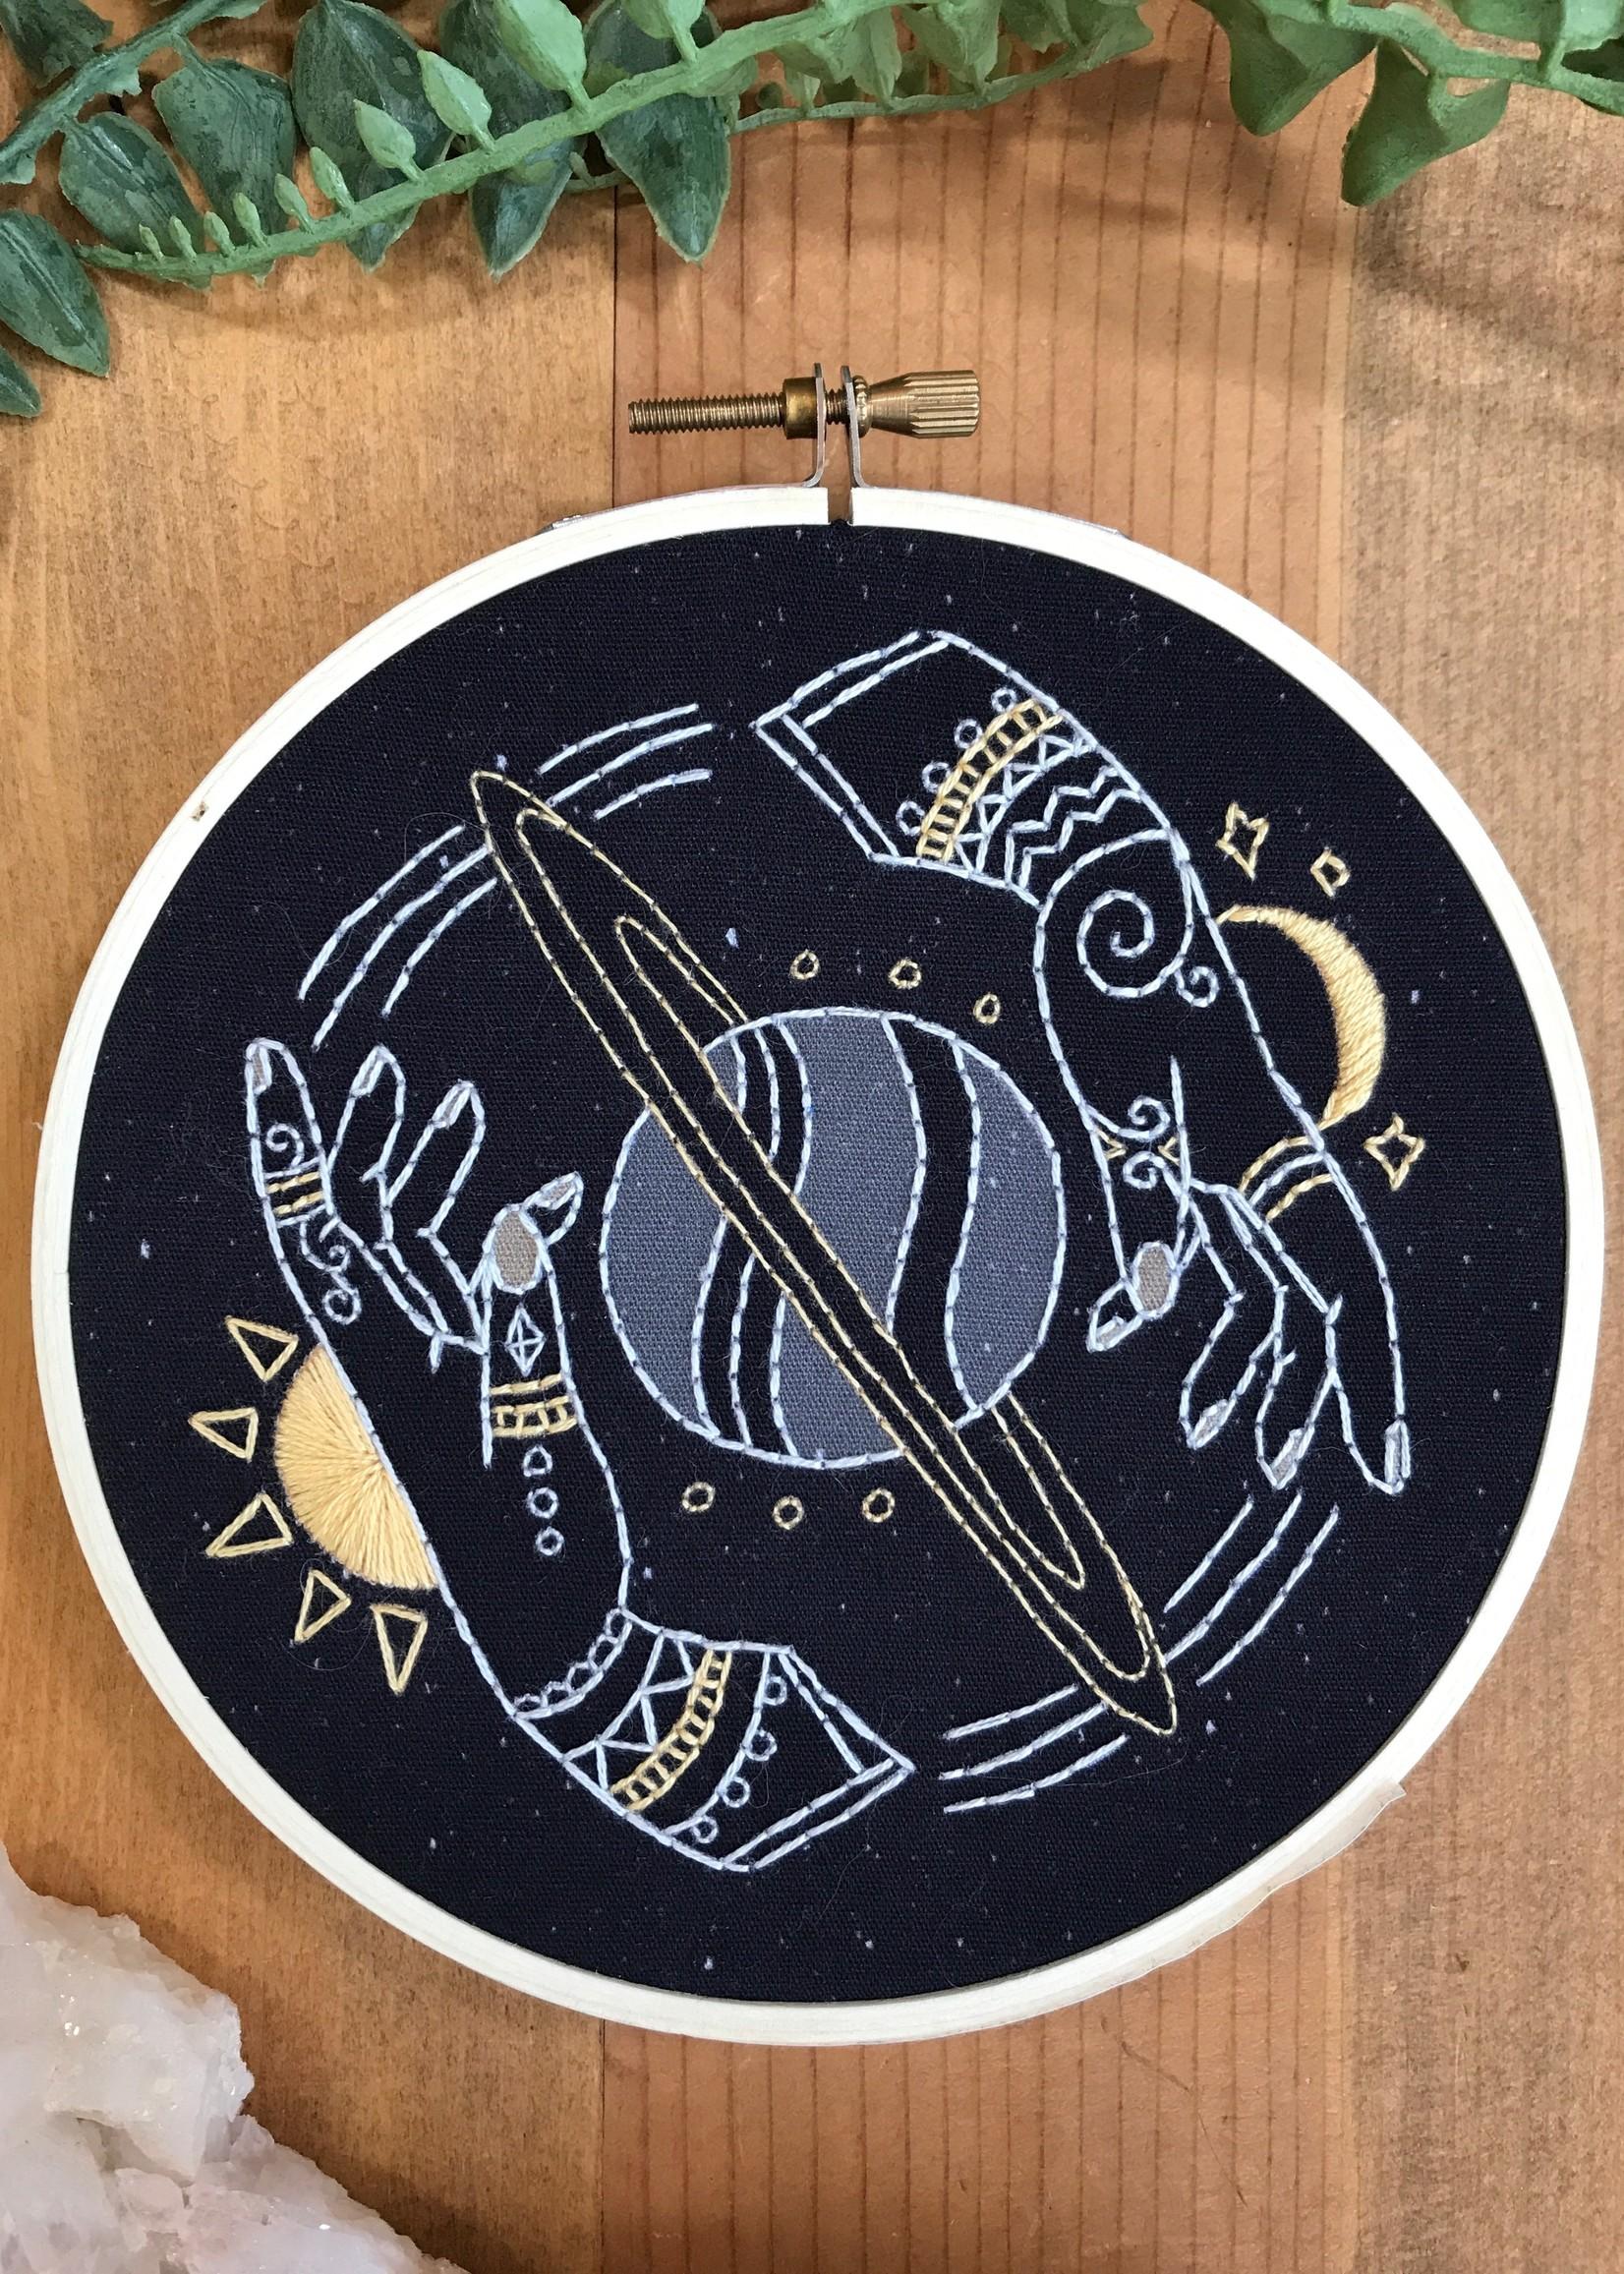 DIY Stitch Kit - Equinox Embrace